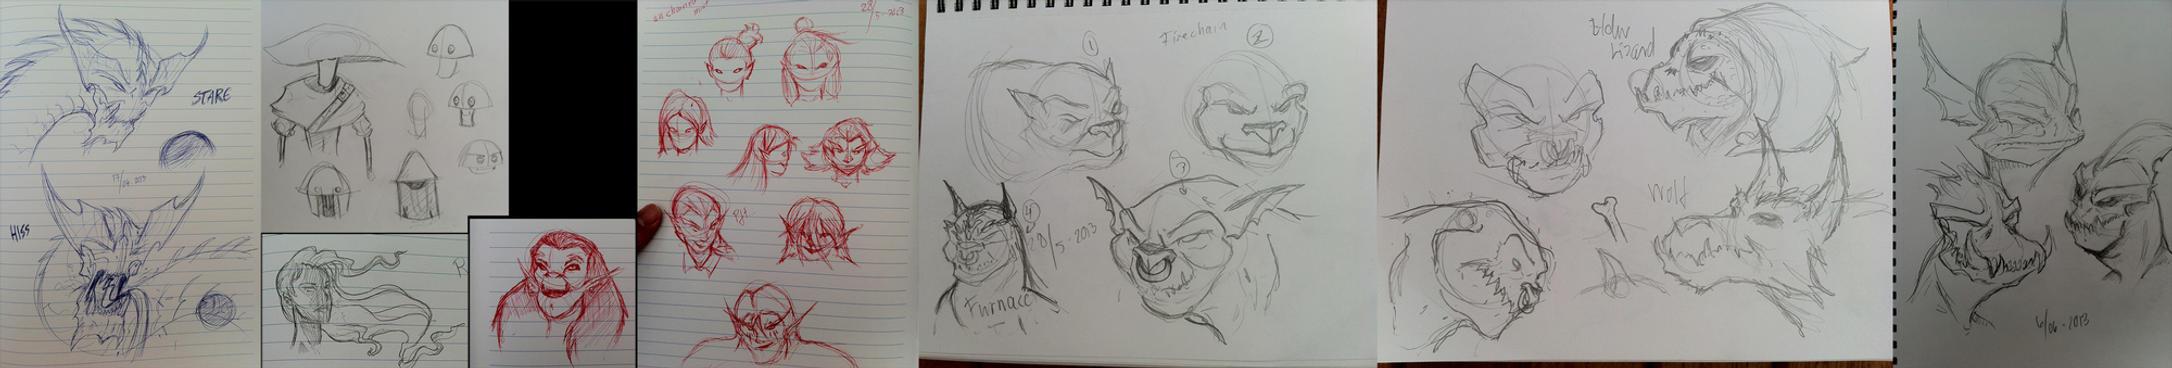 Sketchdump by Malinidk